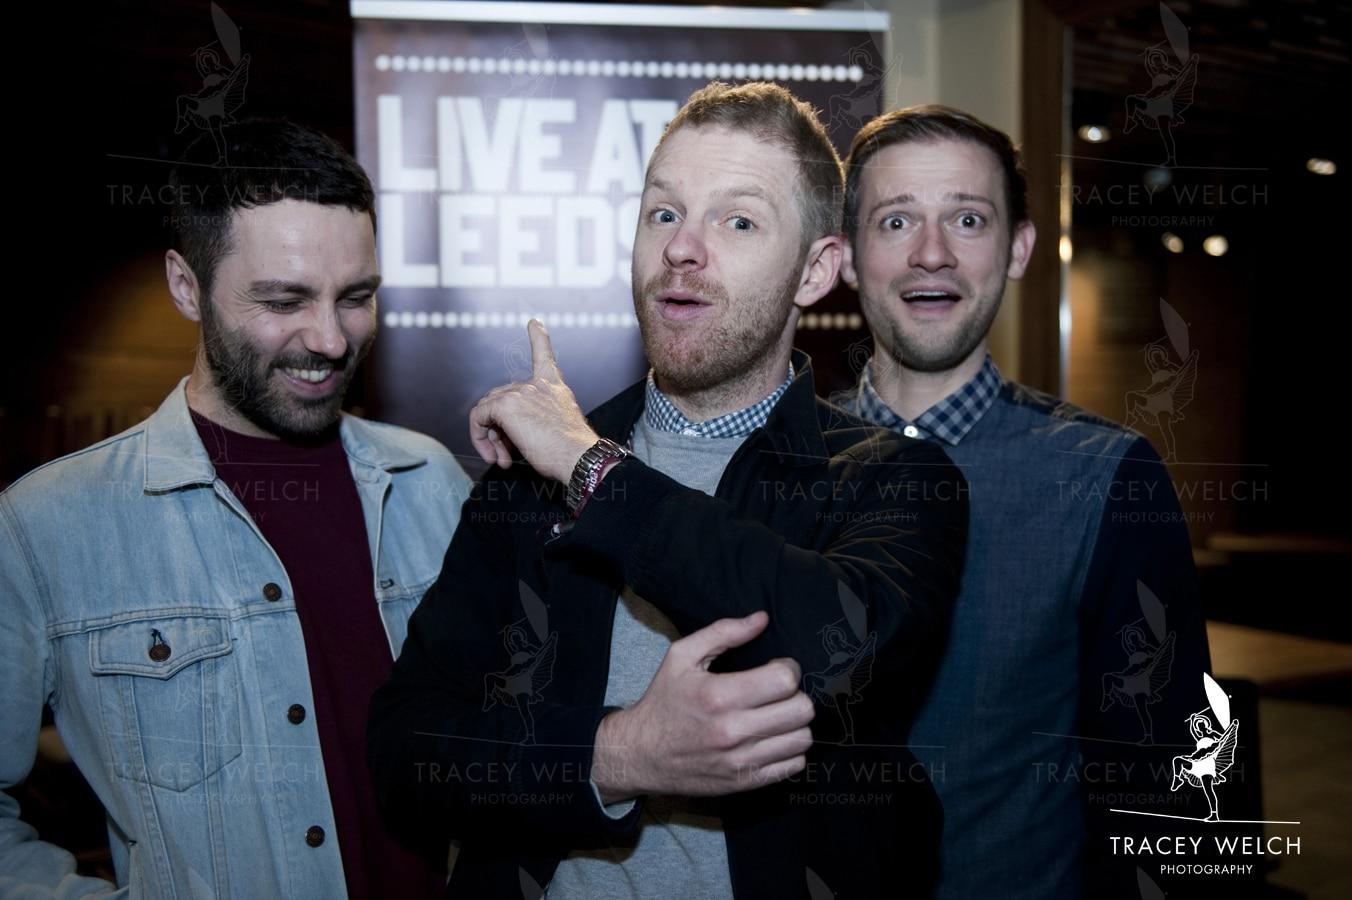 The_Sunshire_underground_Live@Leeds